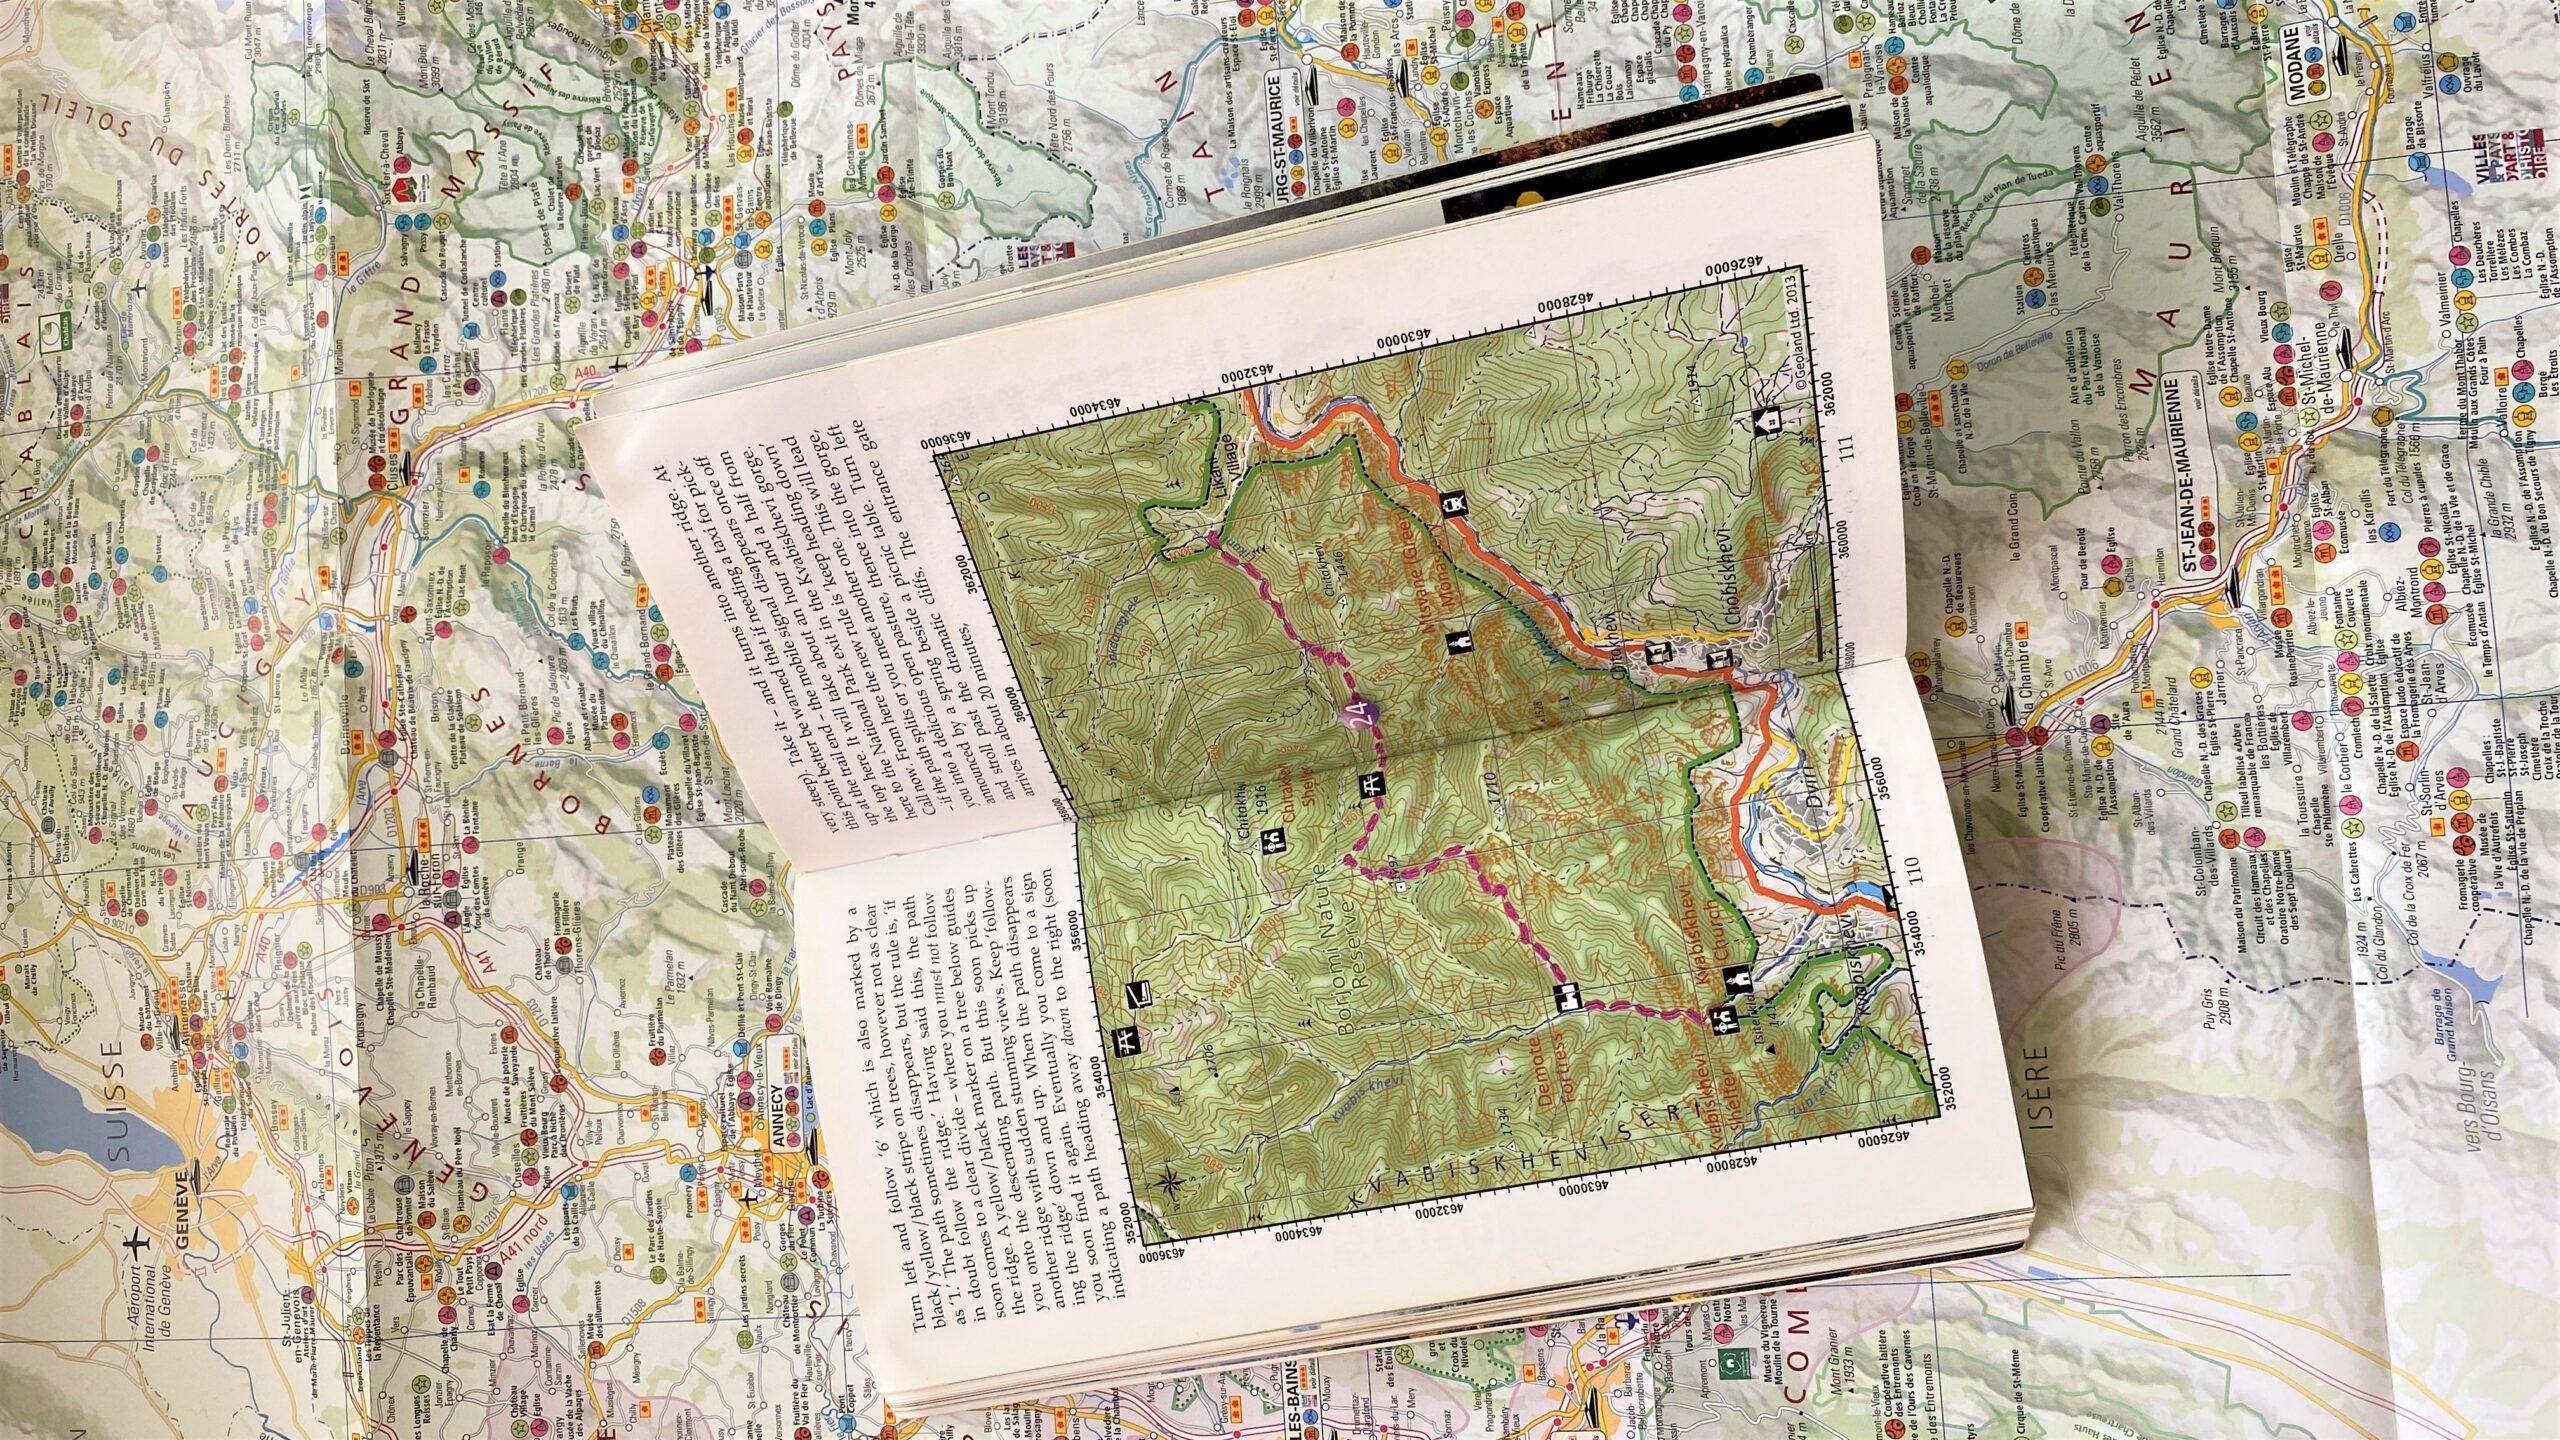 A pic of a map, to show that I know how to read maps